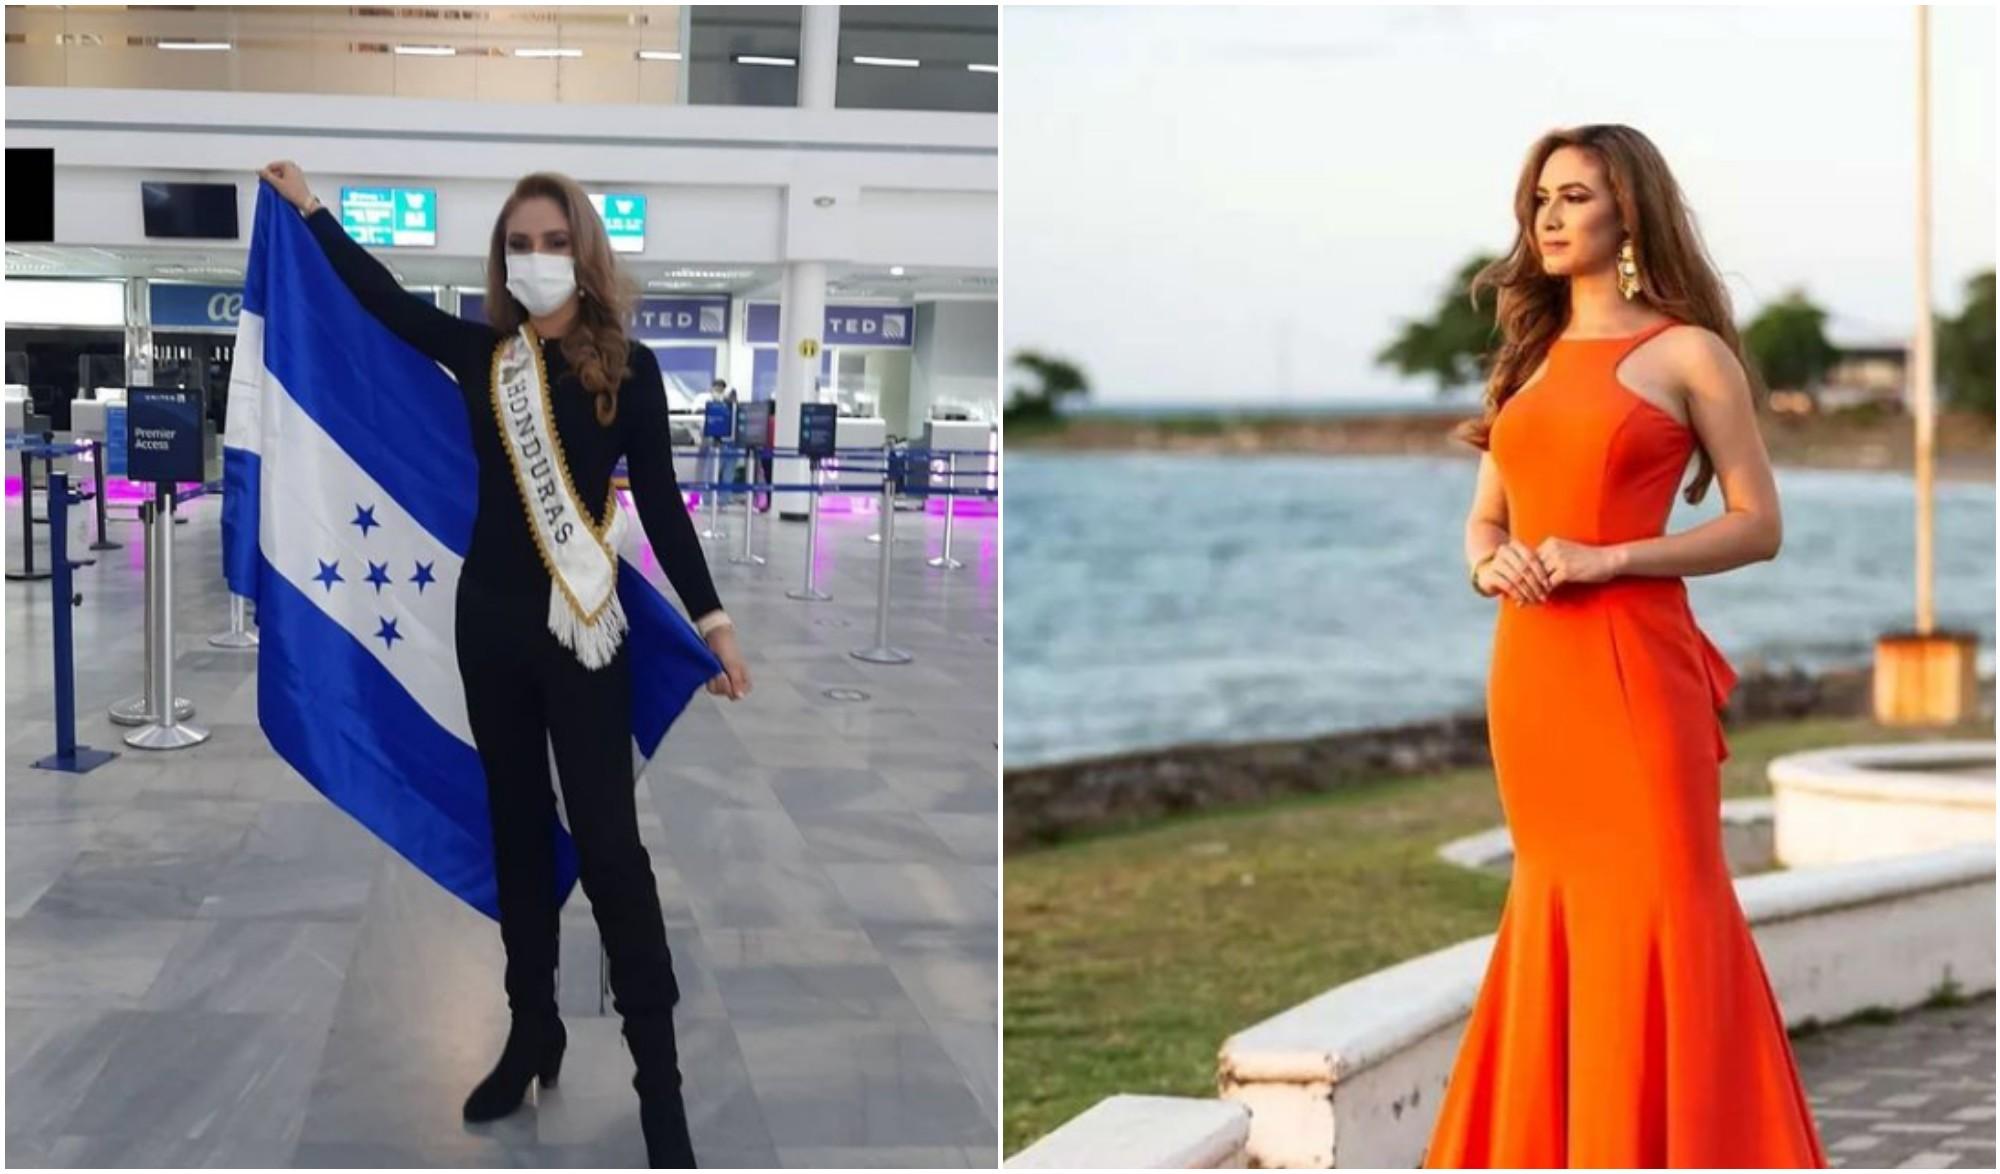 La Reina Hispanoamericana de Honduras ya se encuentra en Bolivia